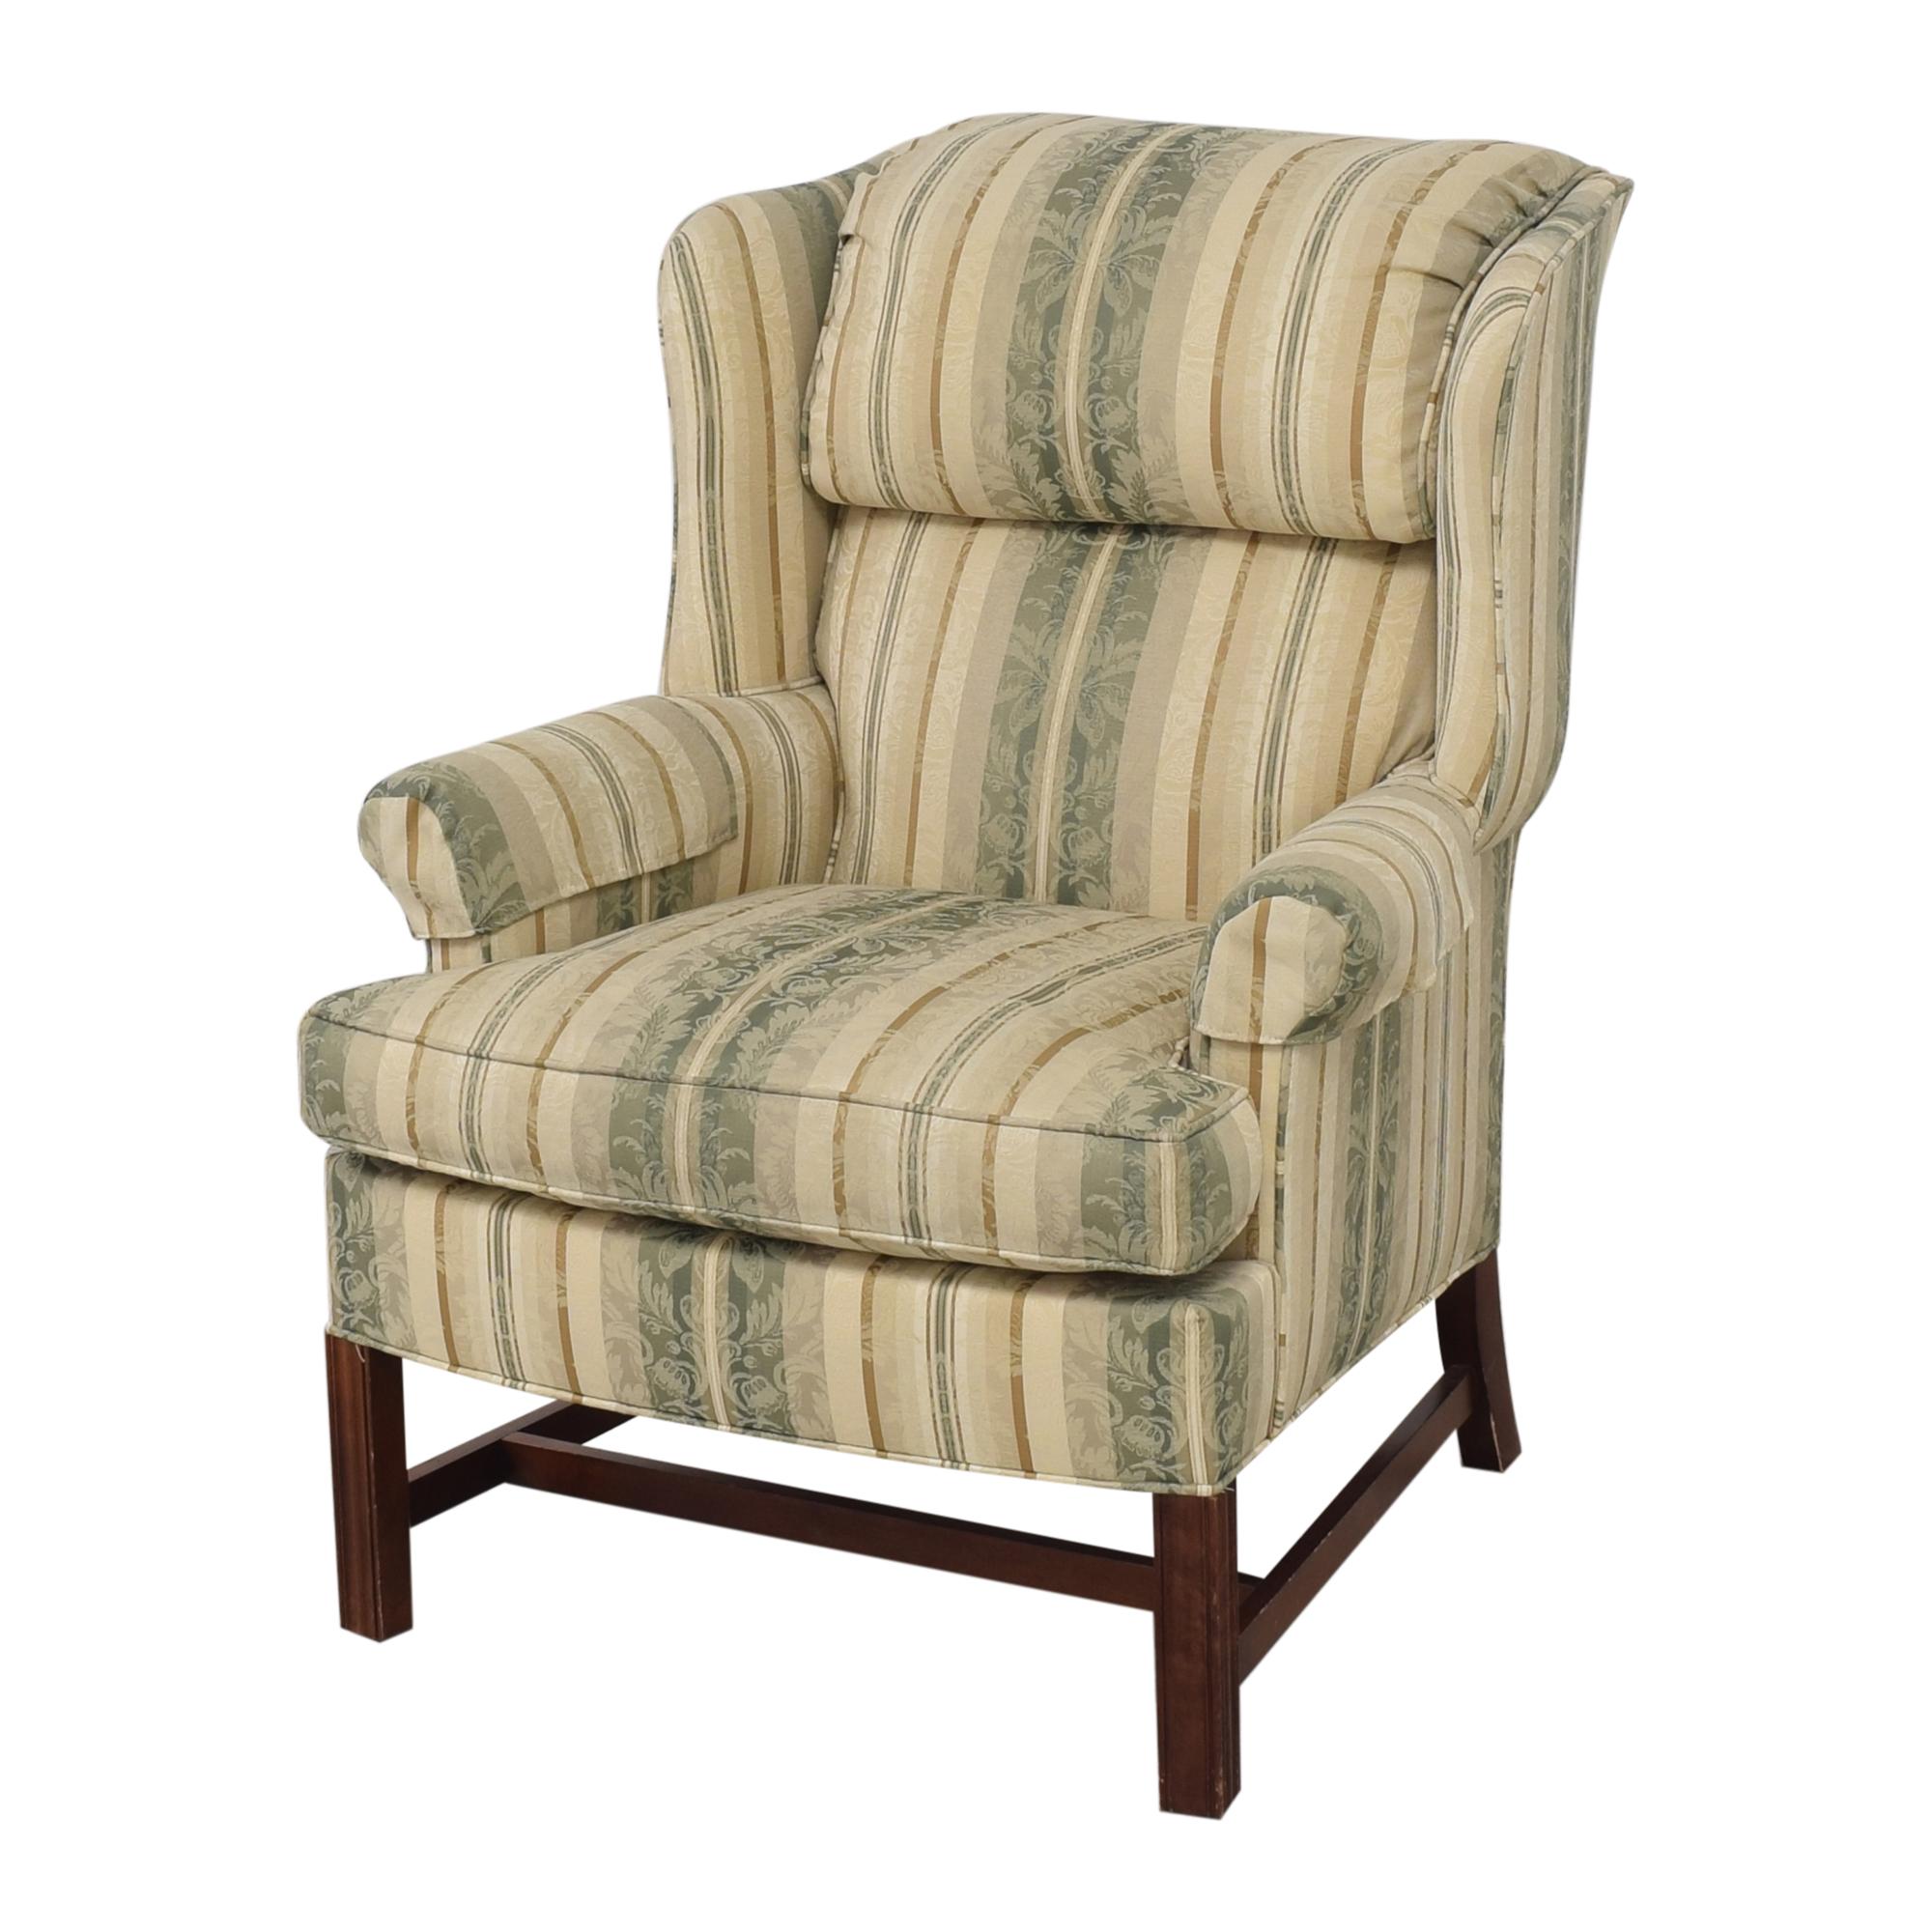 buy Woodmark Woodmark Wing Back Accent Chair online